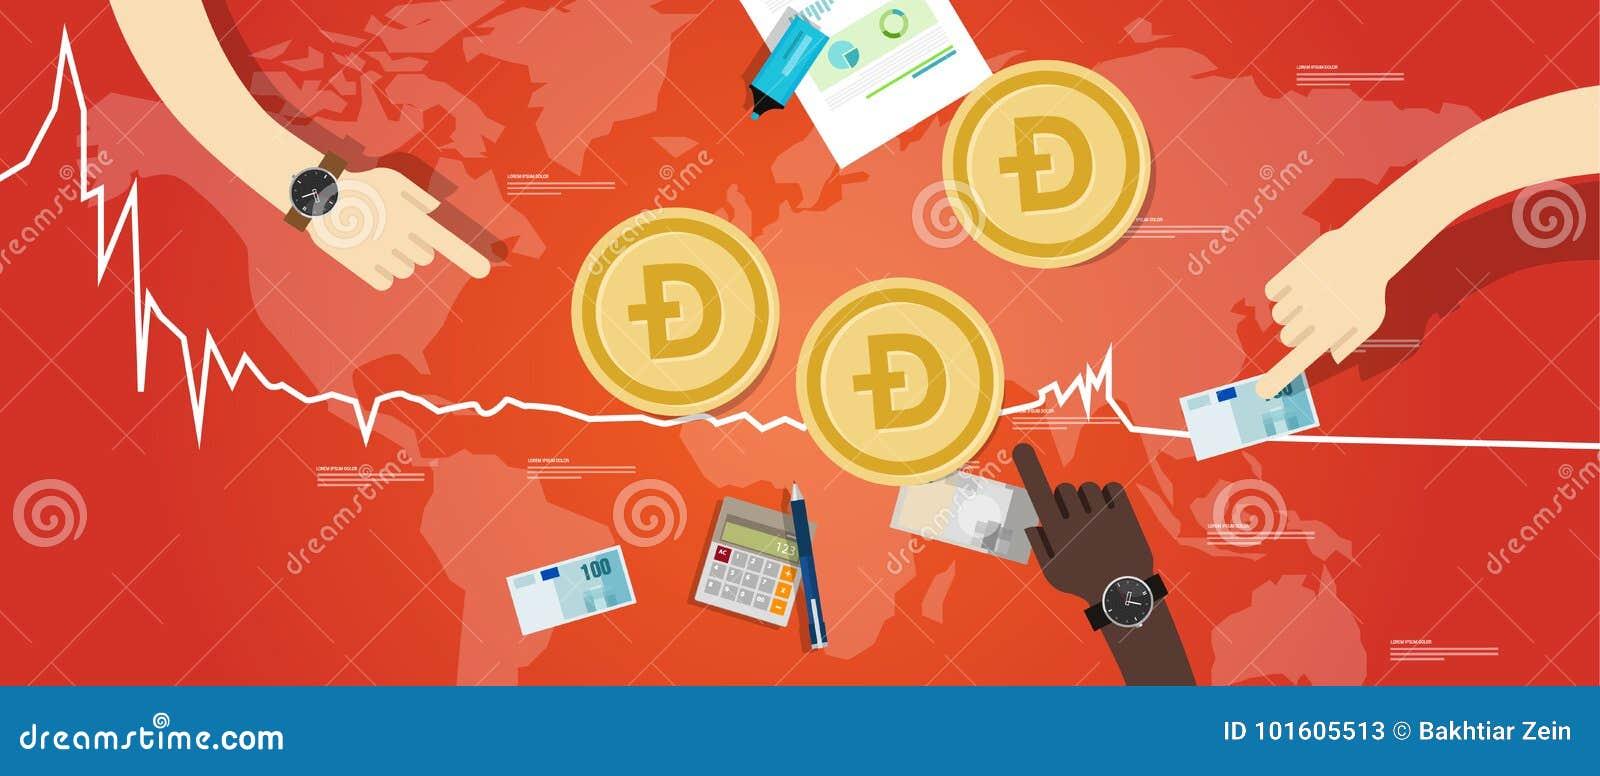 Doge Coin Decrease Exchange Value Digital Virtual Price Down Chart